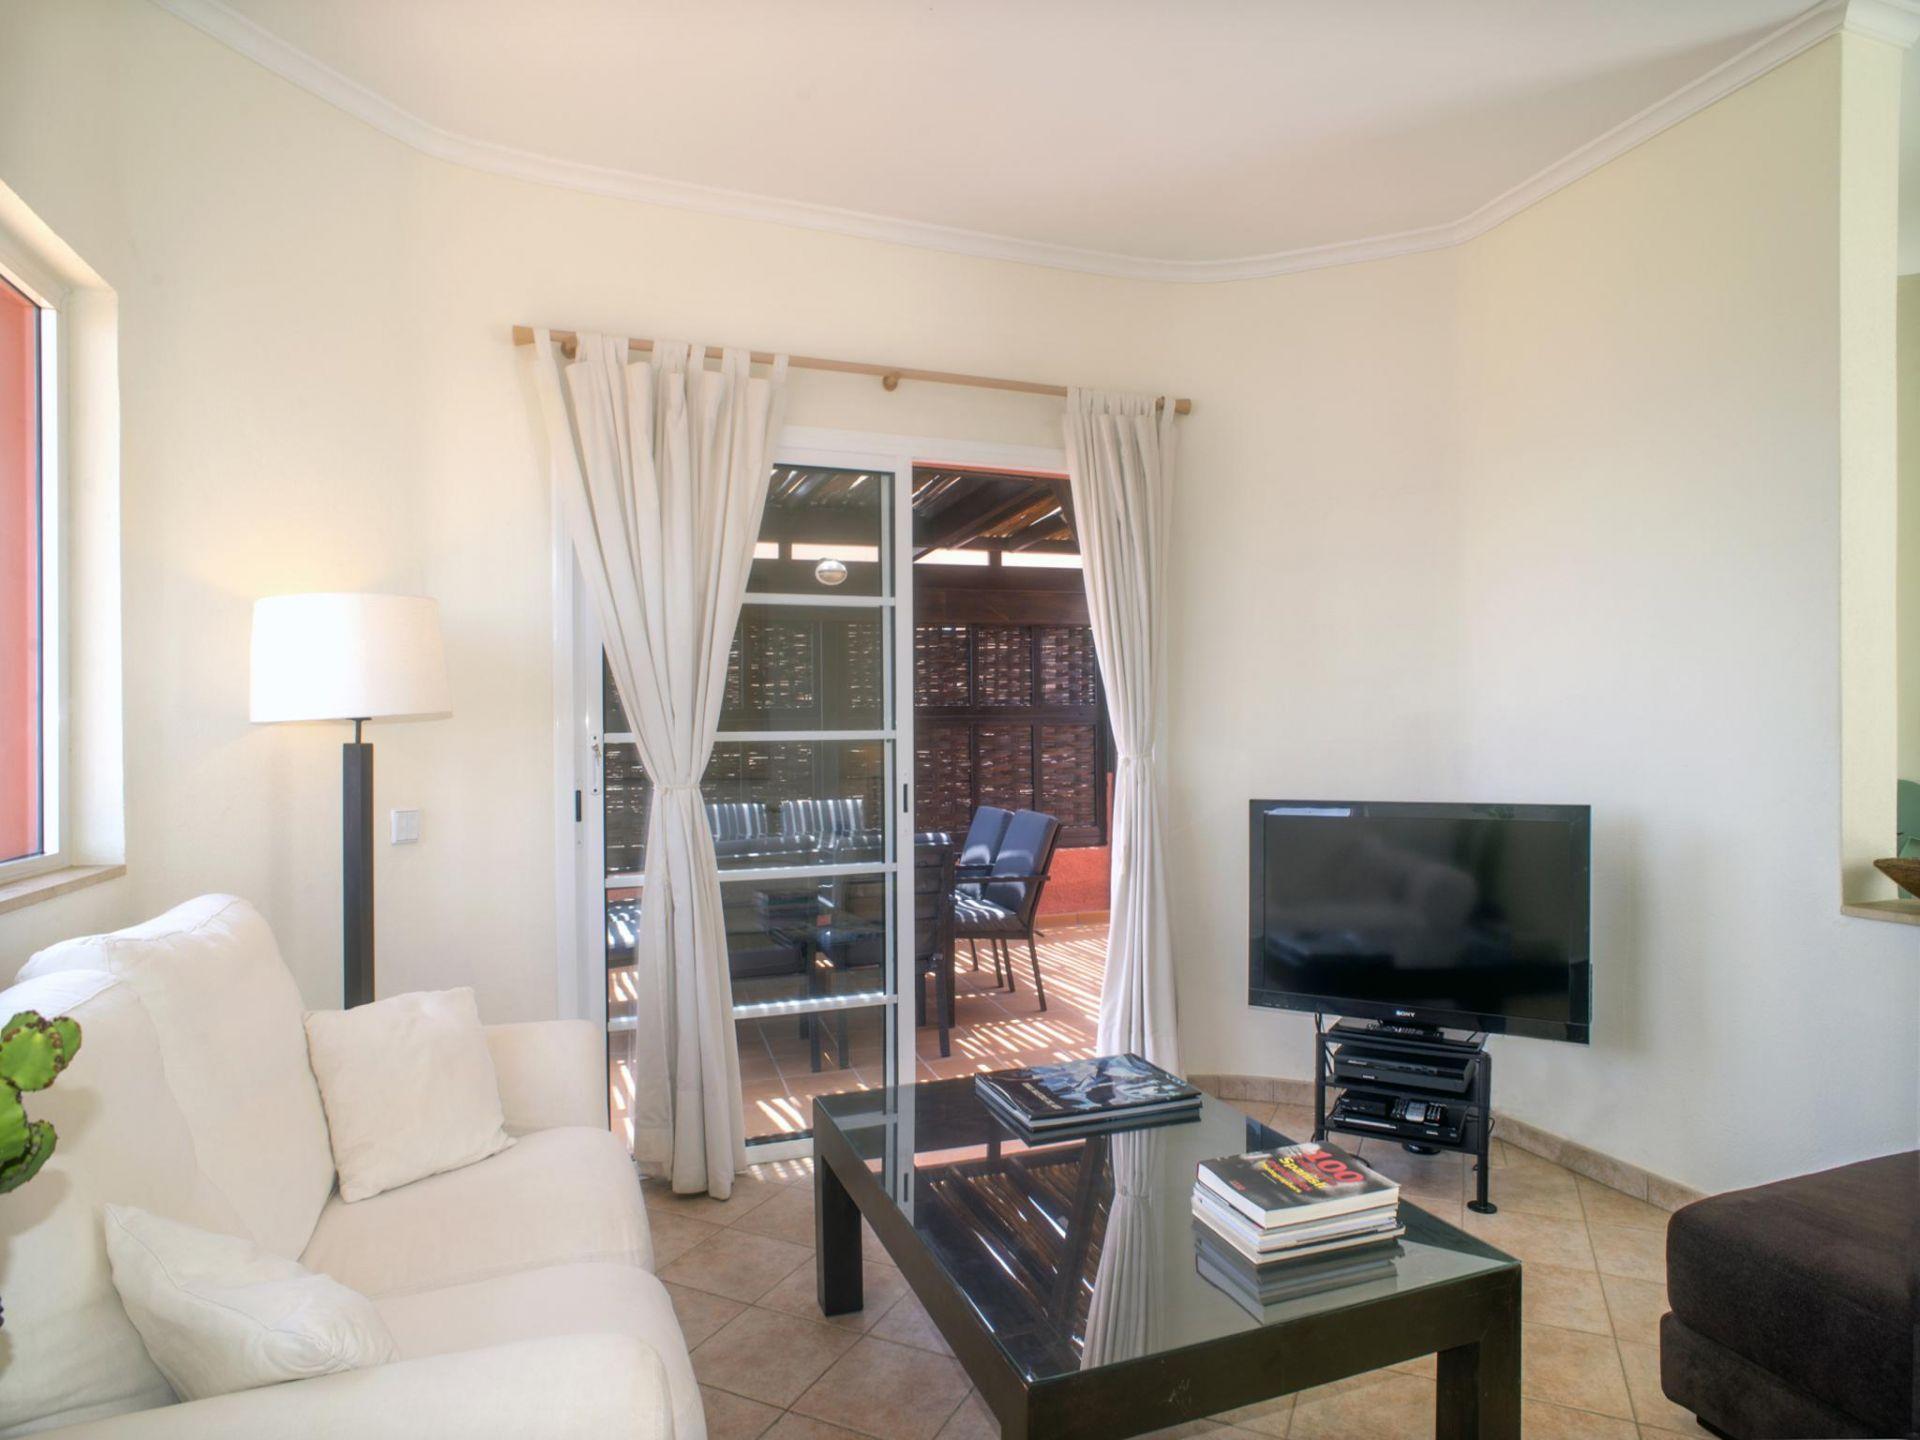 Holiday apartment Villa San Agustin 10 - Holiday Rental (854295), Maspalomas, Gran Canaria, Canary Islands, Spain, picture 32